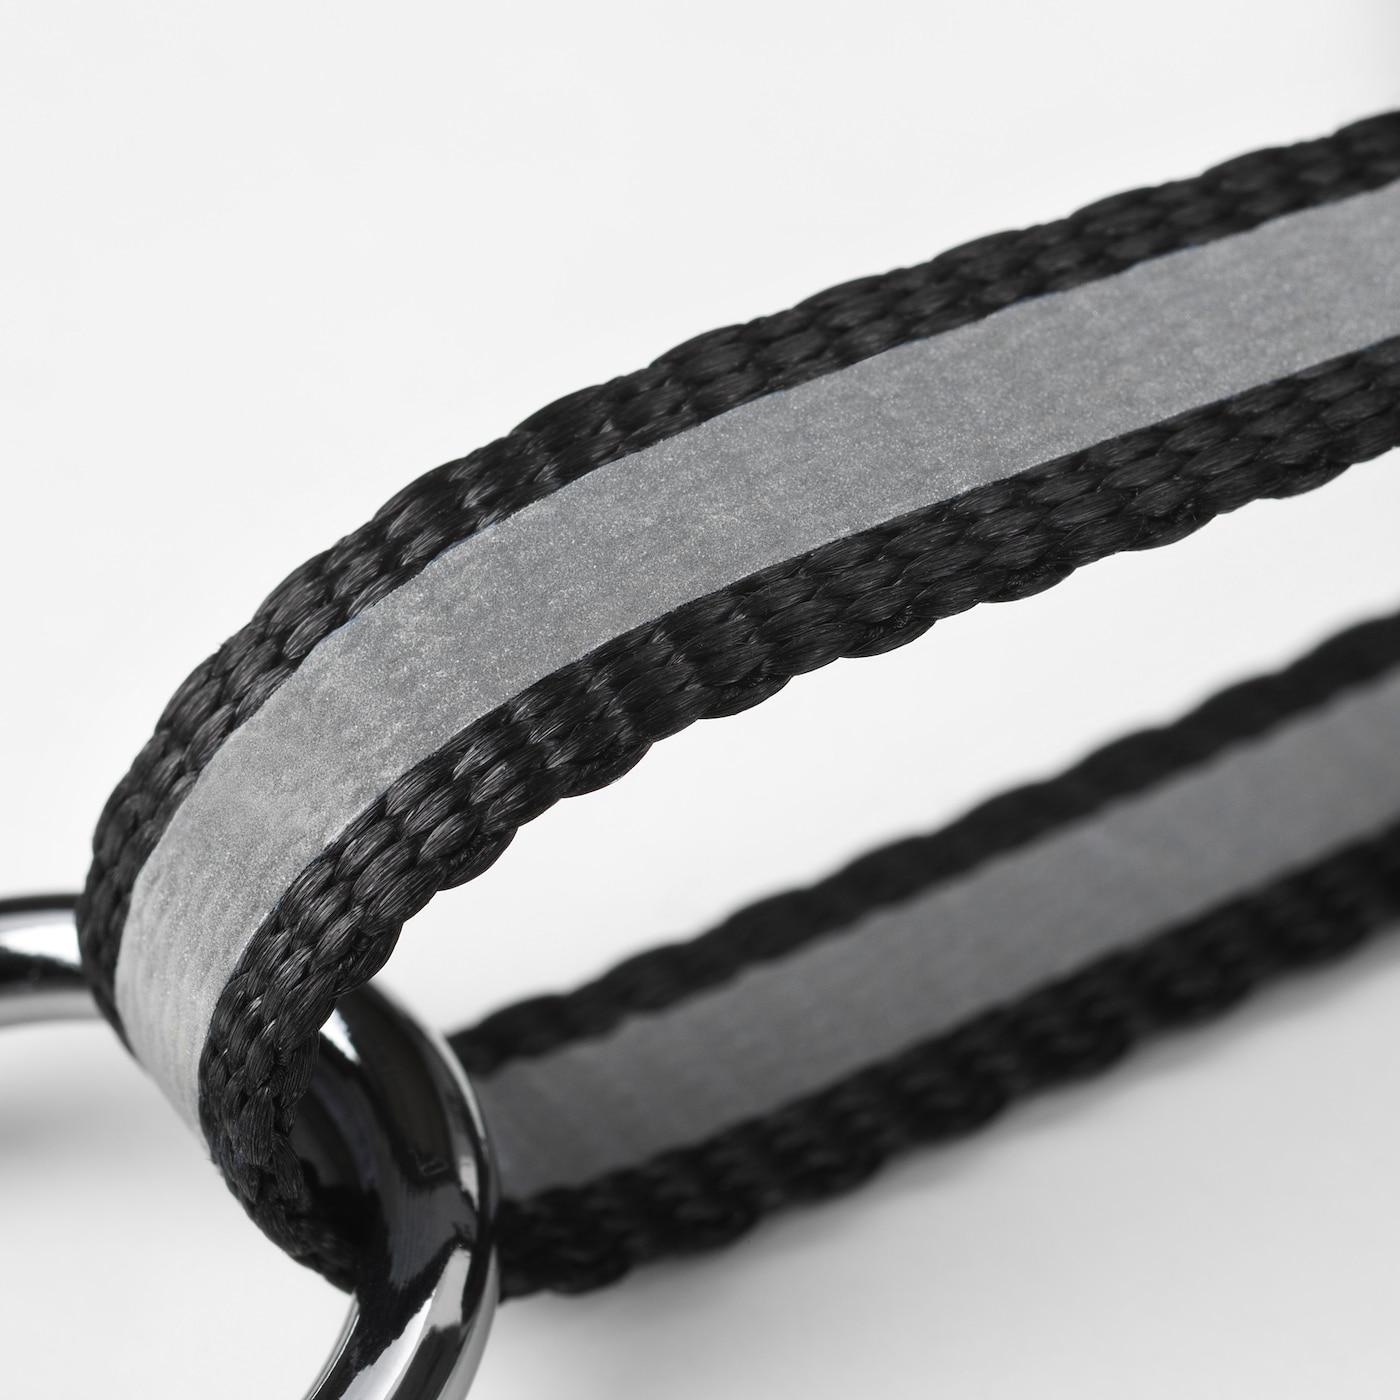 LURVIG Reflektorgurt, schwarz, 34-52x38-58 cm